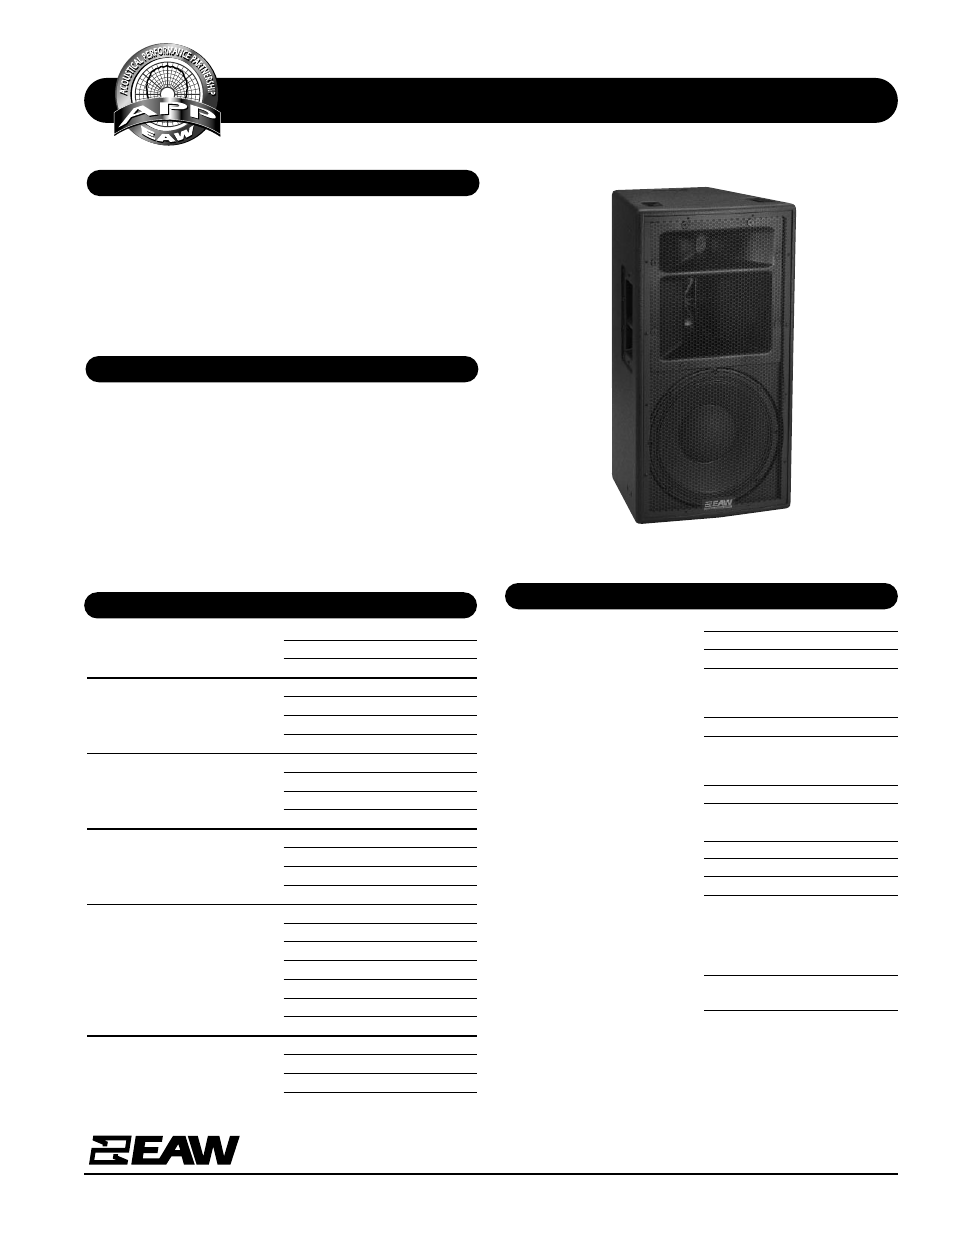 eaw kf300z user manual 2 pages rh manualsdir com